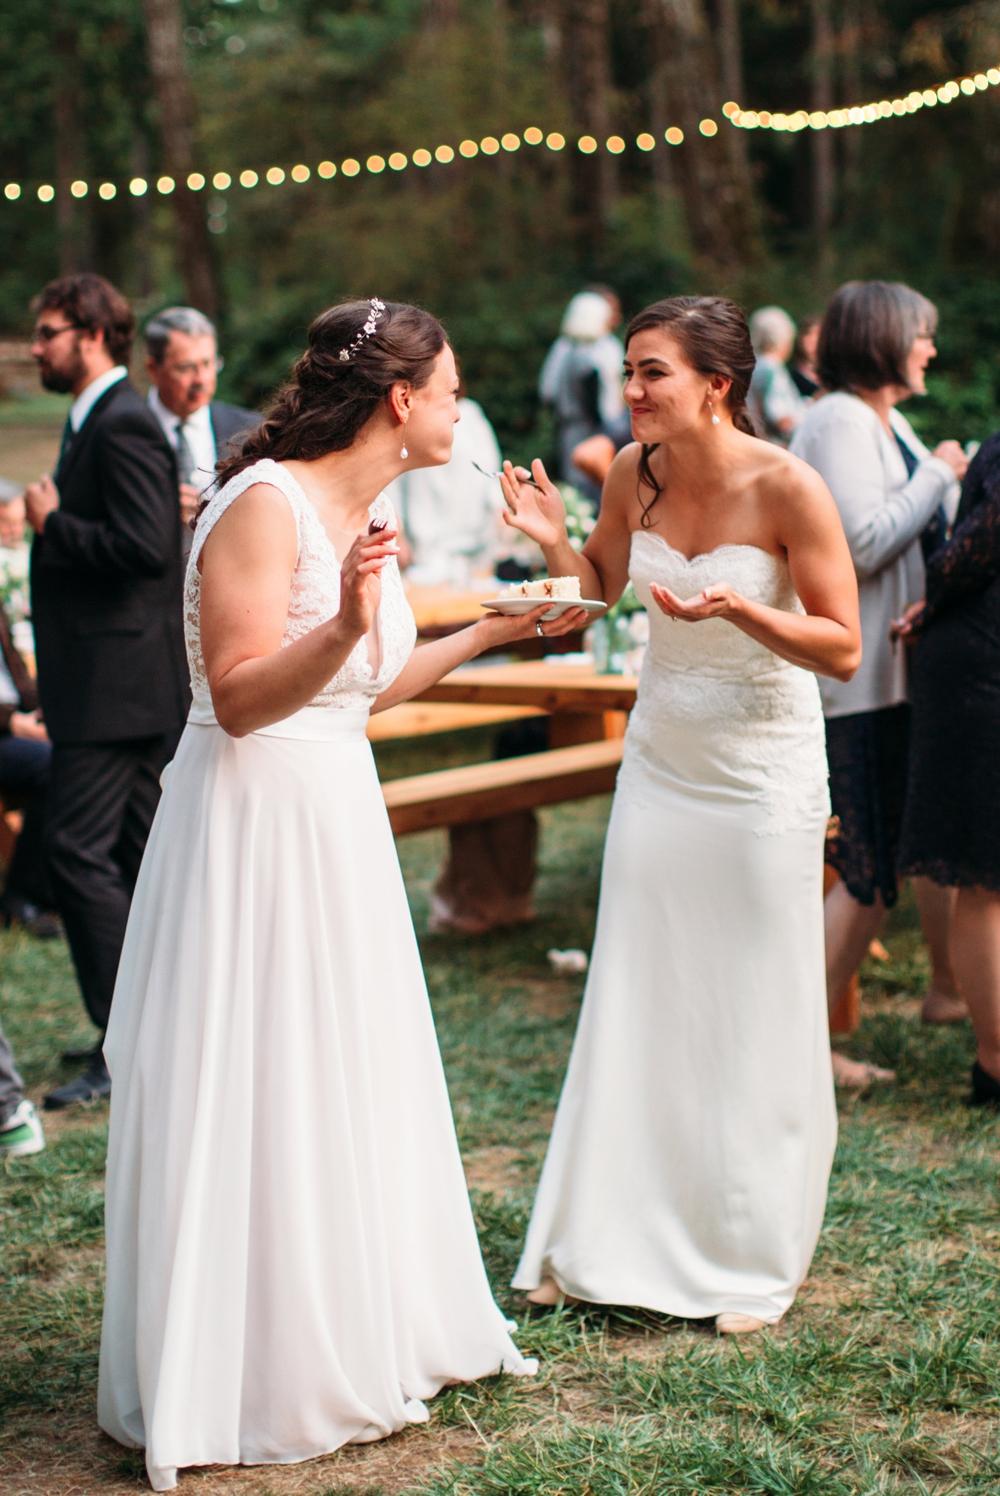 brides-share-wedding-cake